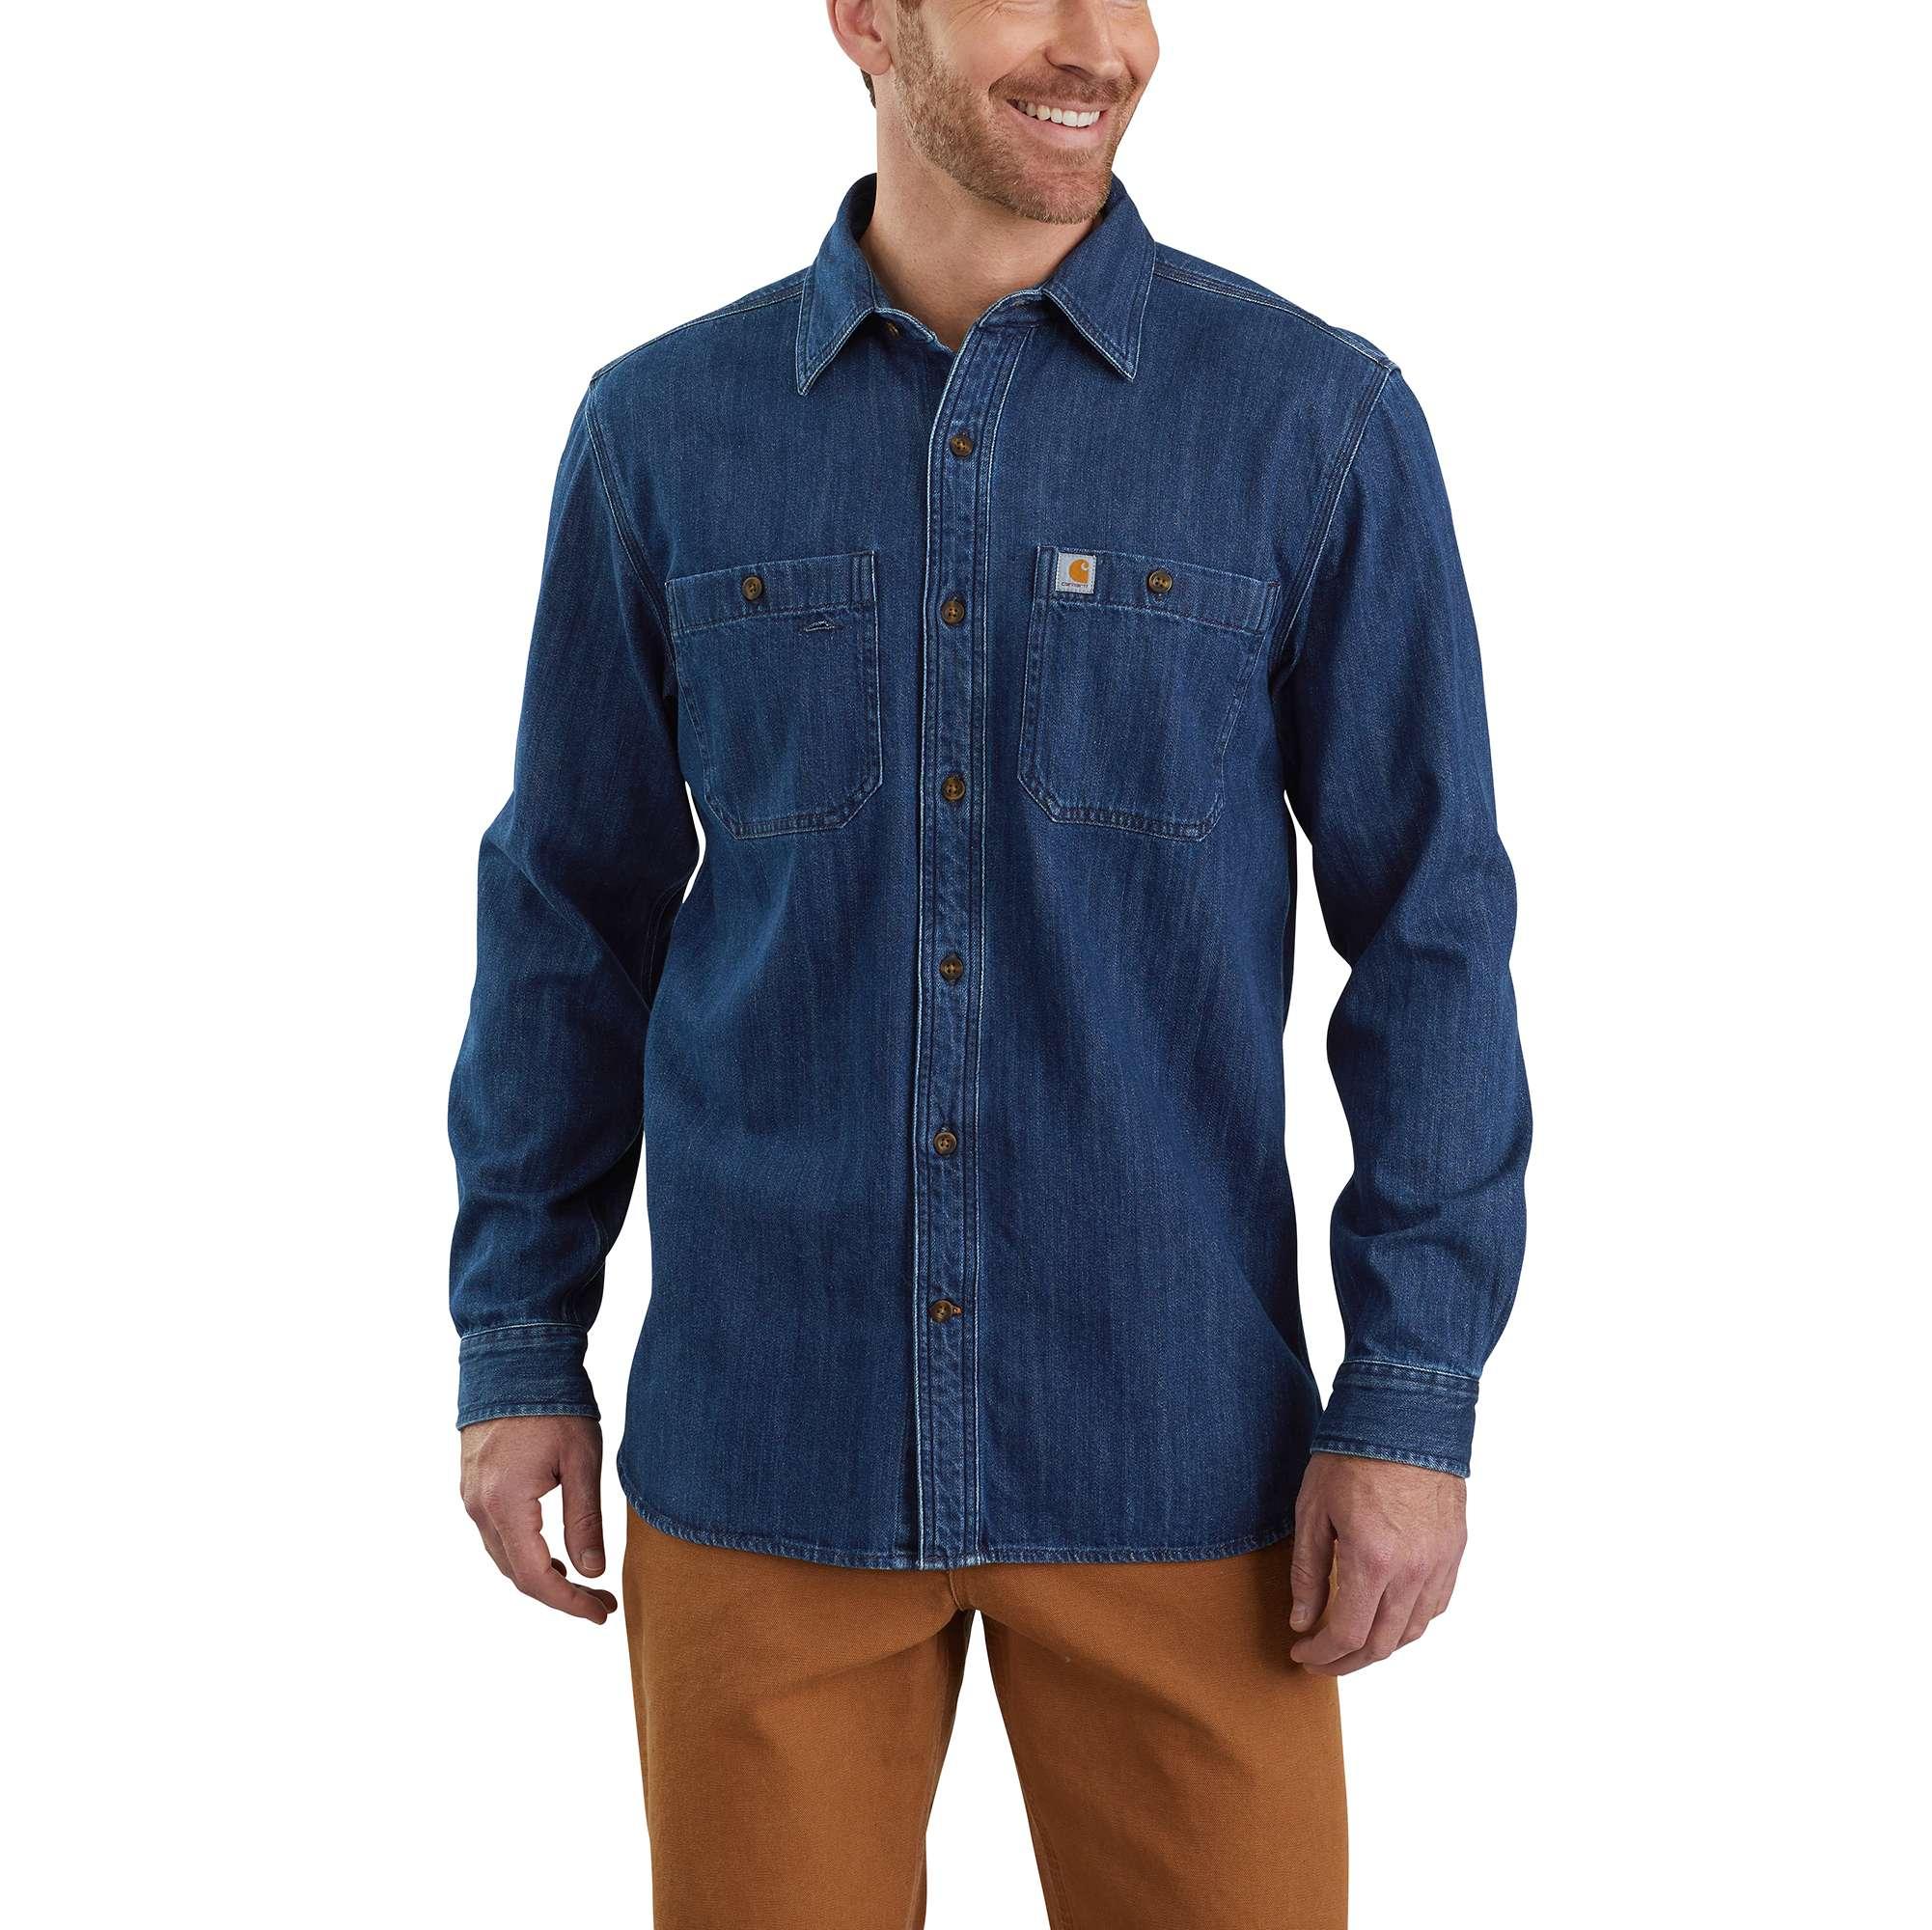 Carhartt Denim Long-Sleeve Shirt